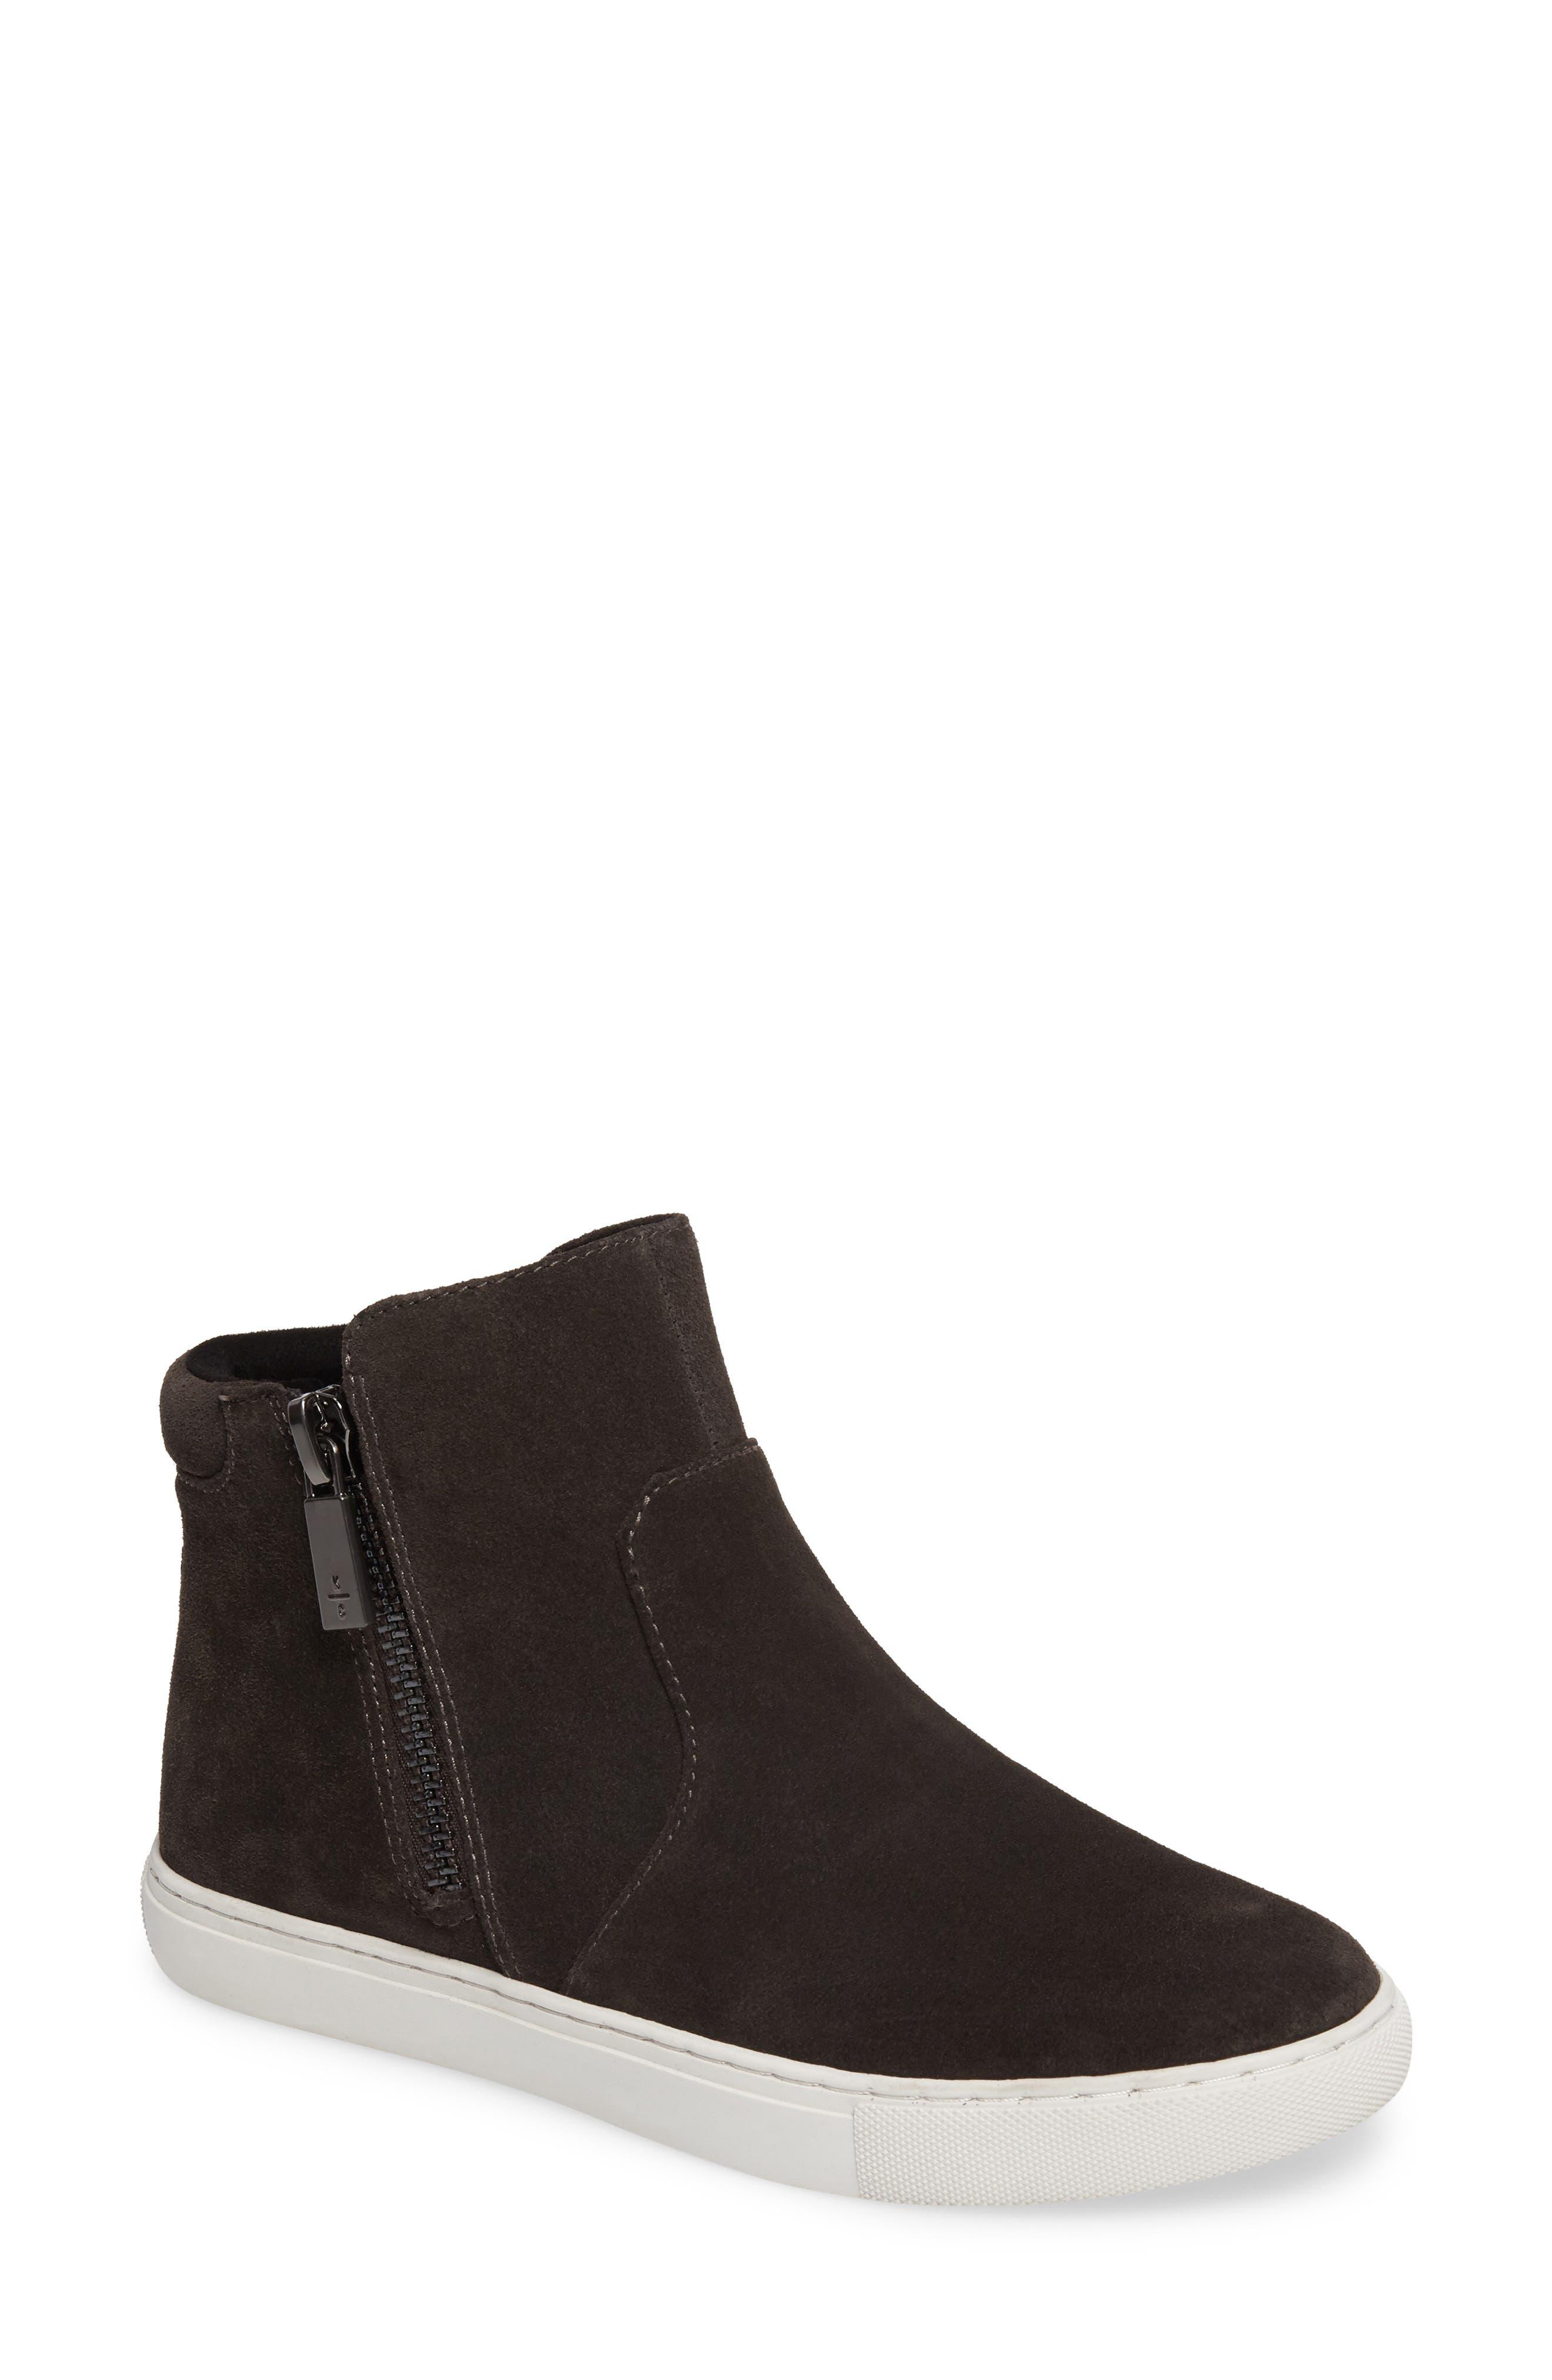 'Kiera' Zip High Top Sneaker,                         Main,                         color, Asphalt Suede